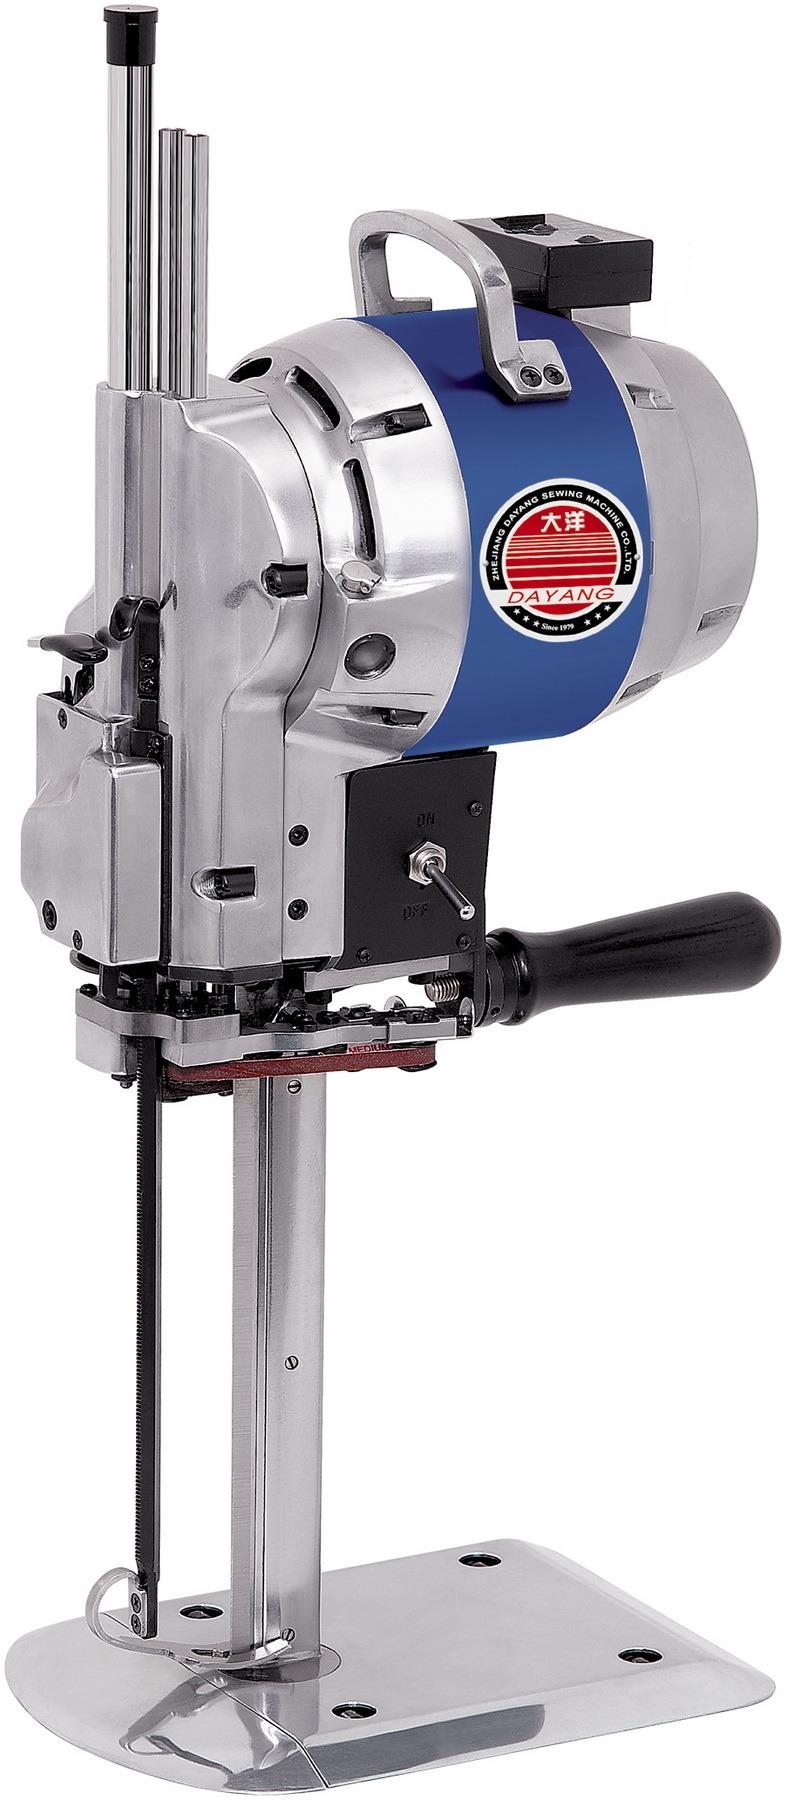 Eastman 629X Blue Streak II Type Straight Knife Fabric Cutting Machine 550W (CZD-3)